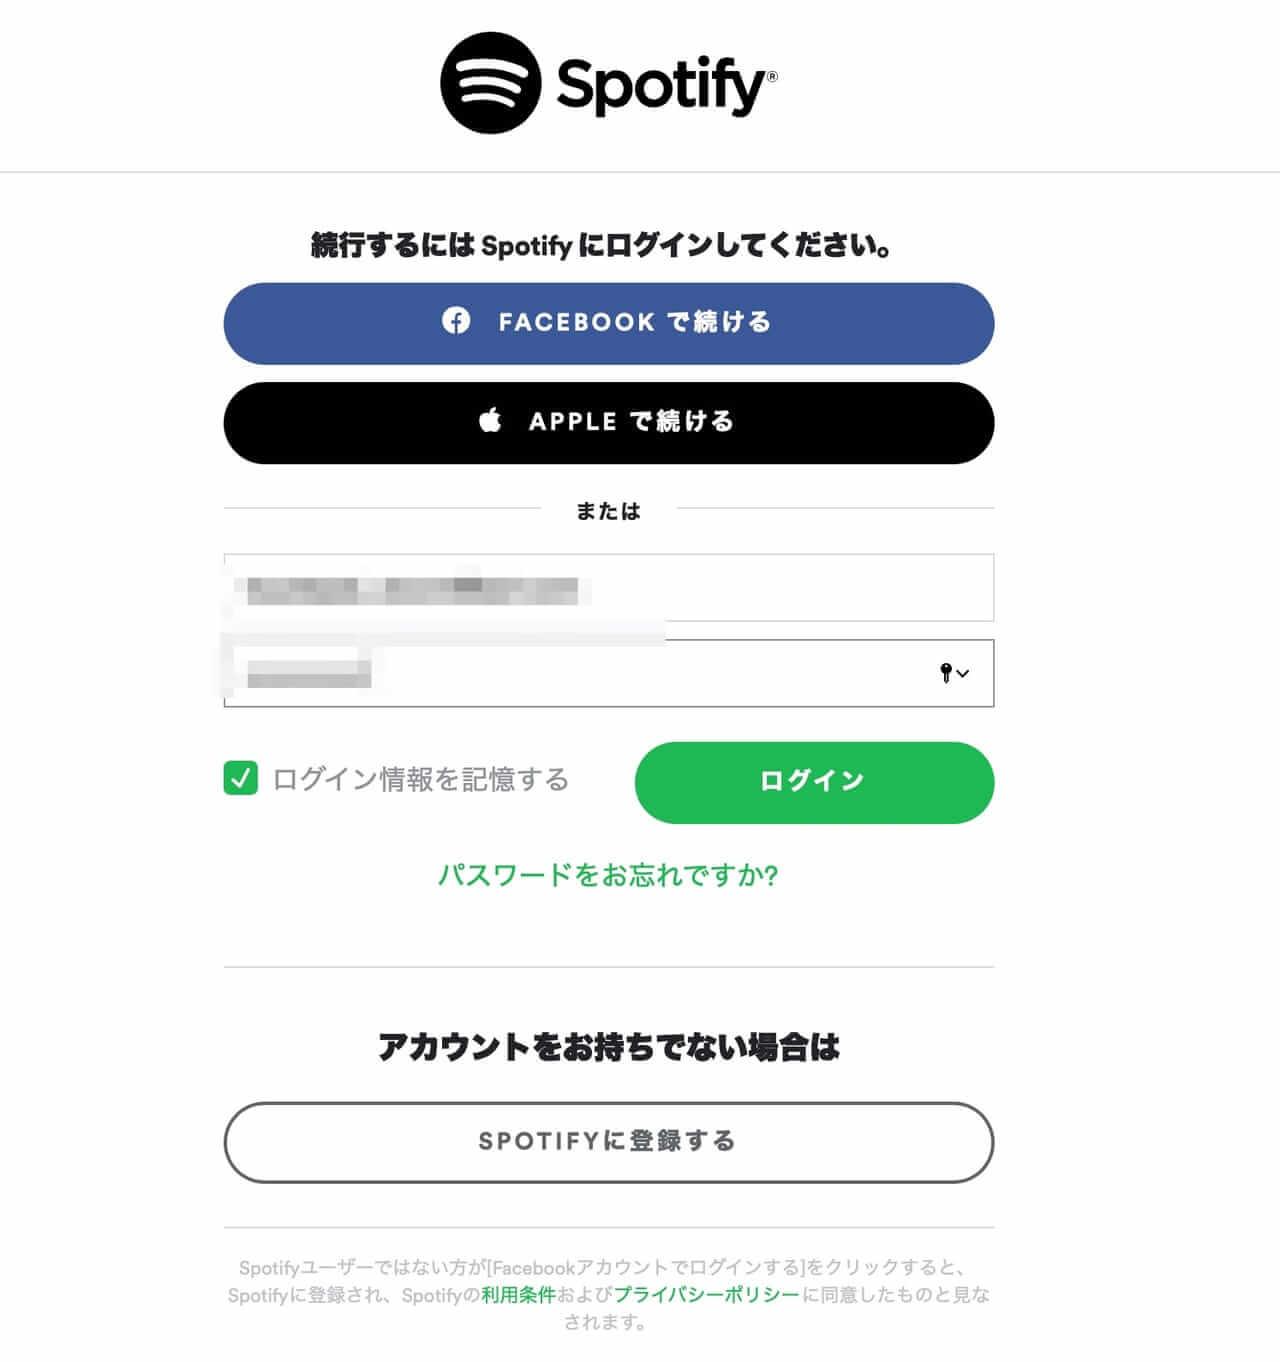 【Study & Practice】Spotify for Artistsを見るメンバーを増やして活用しよう(管理者権限追加)